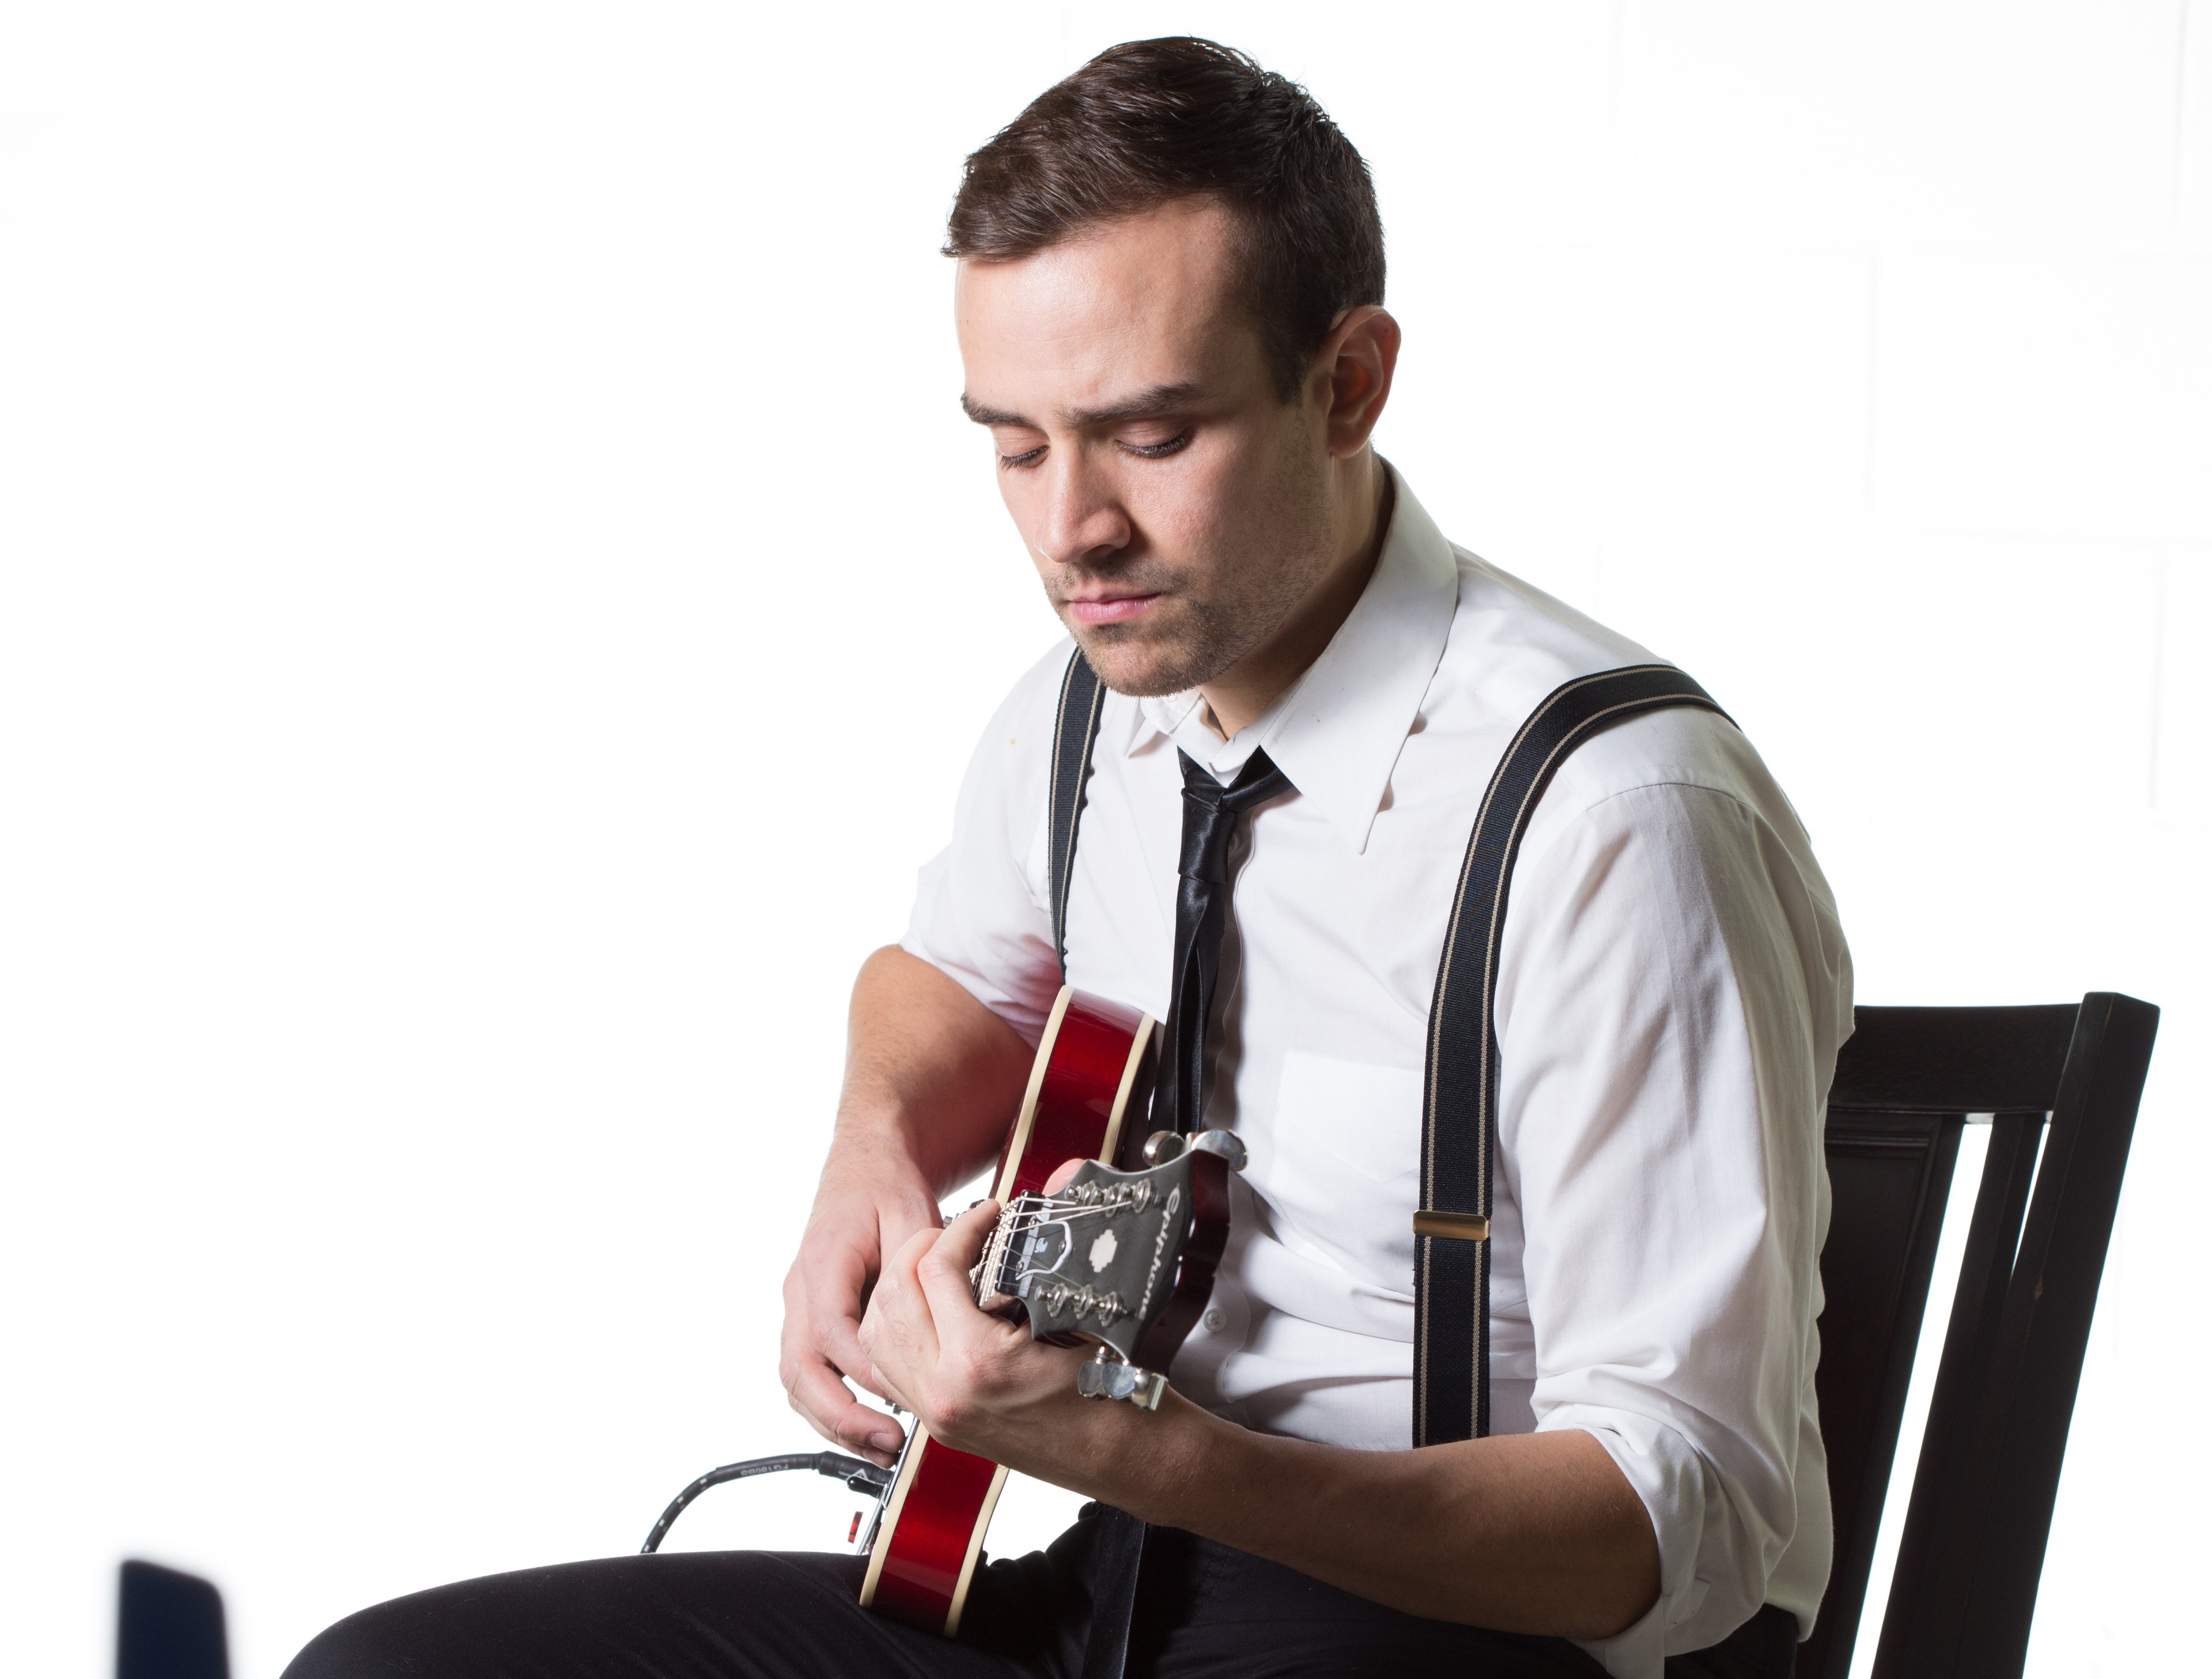 northern michigan singer songwriter benjaman james releases soulful ep